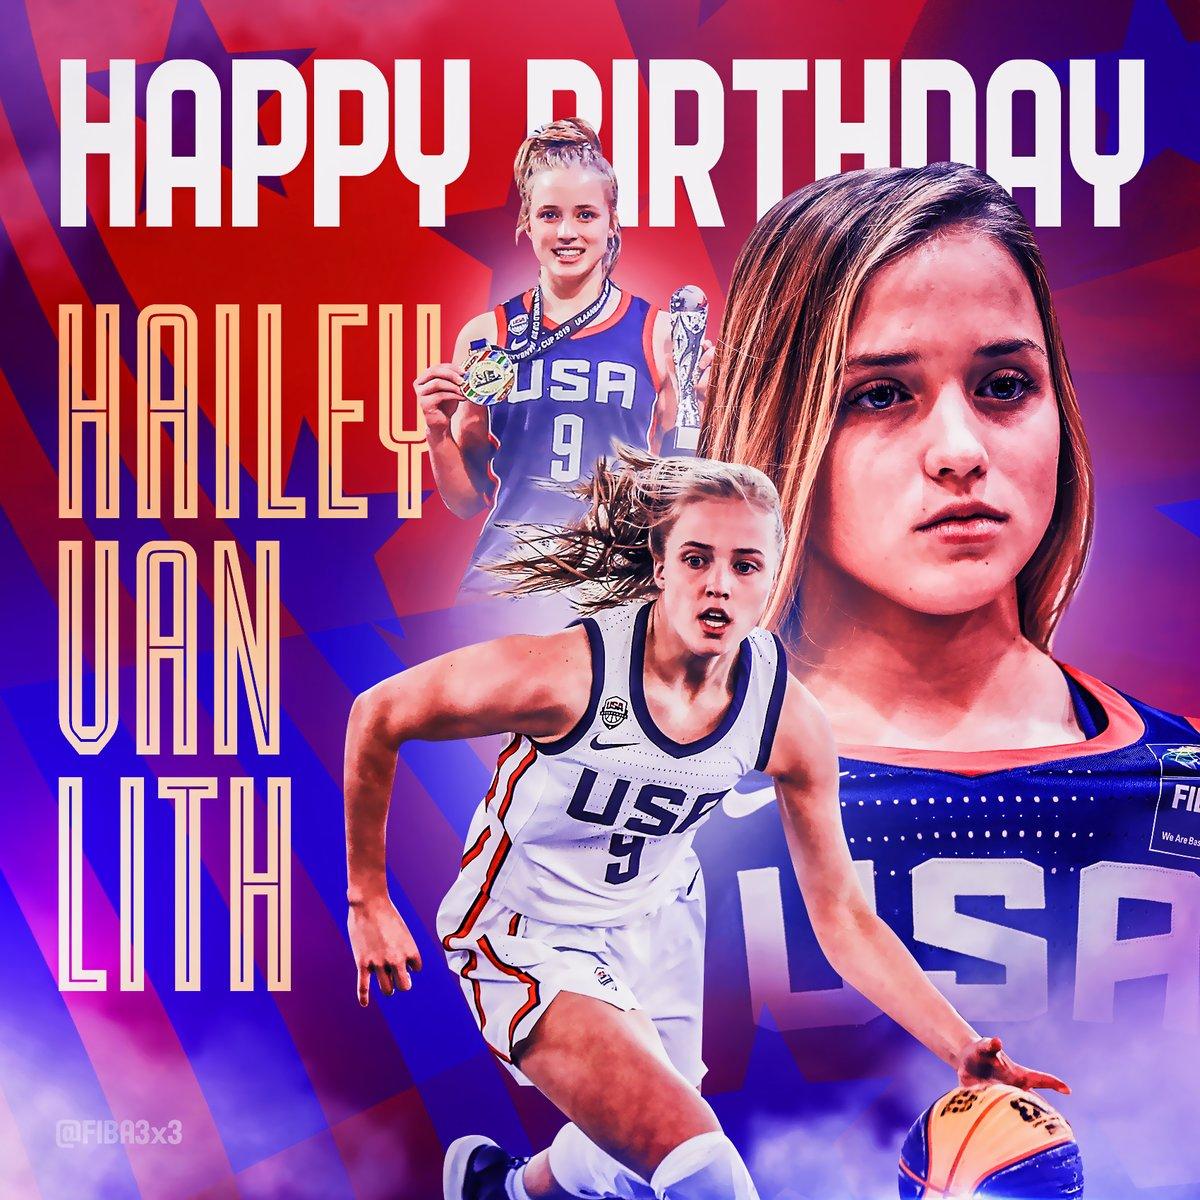 🎉🇺🇸 Happy birthday to our FIBA #3x3U18 World Cup 2019 MVP Hailey van Lith 🎉🇺🇸 @haileyvll | @USAB3x3